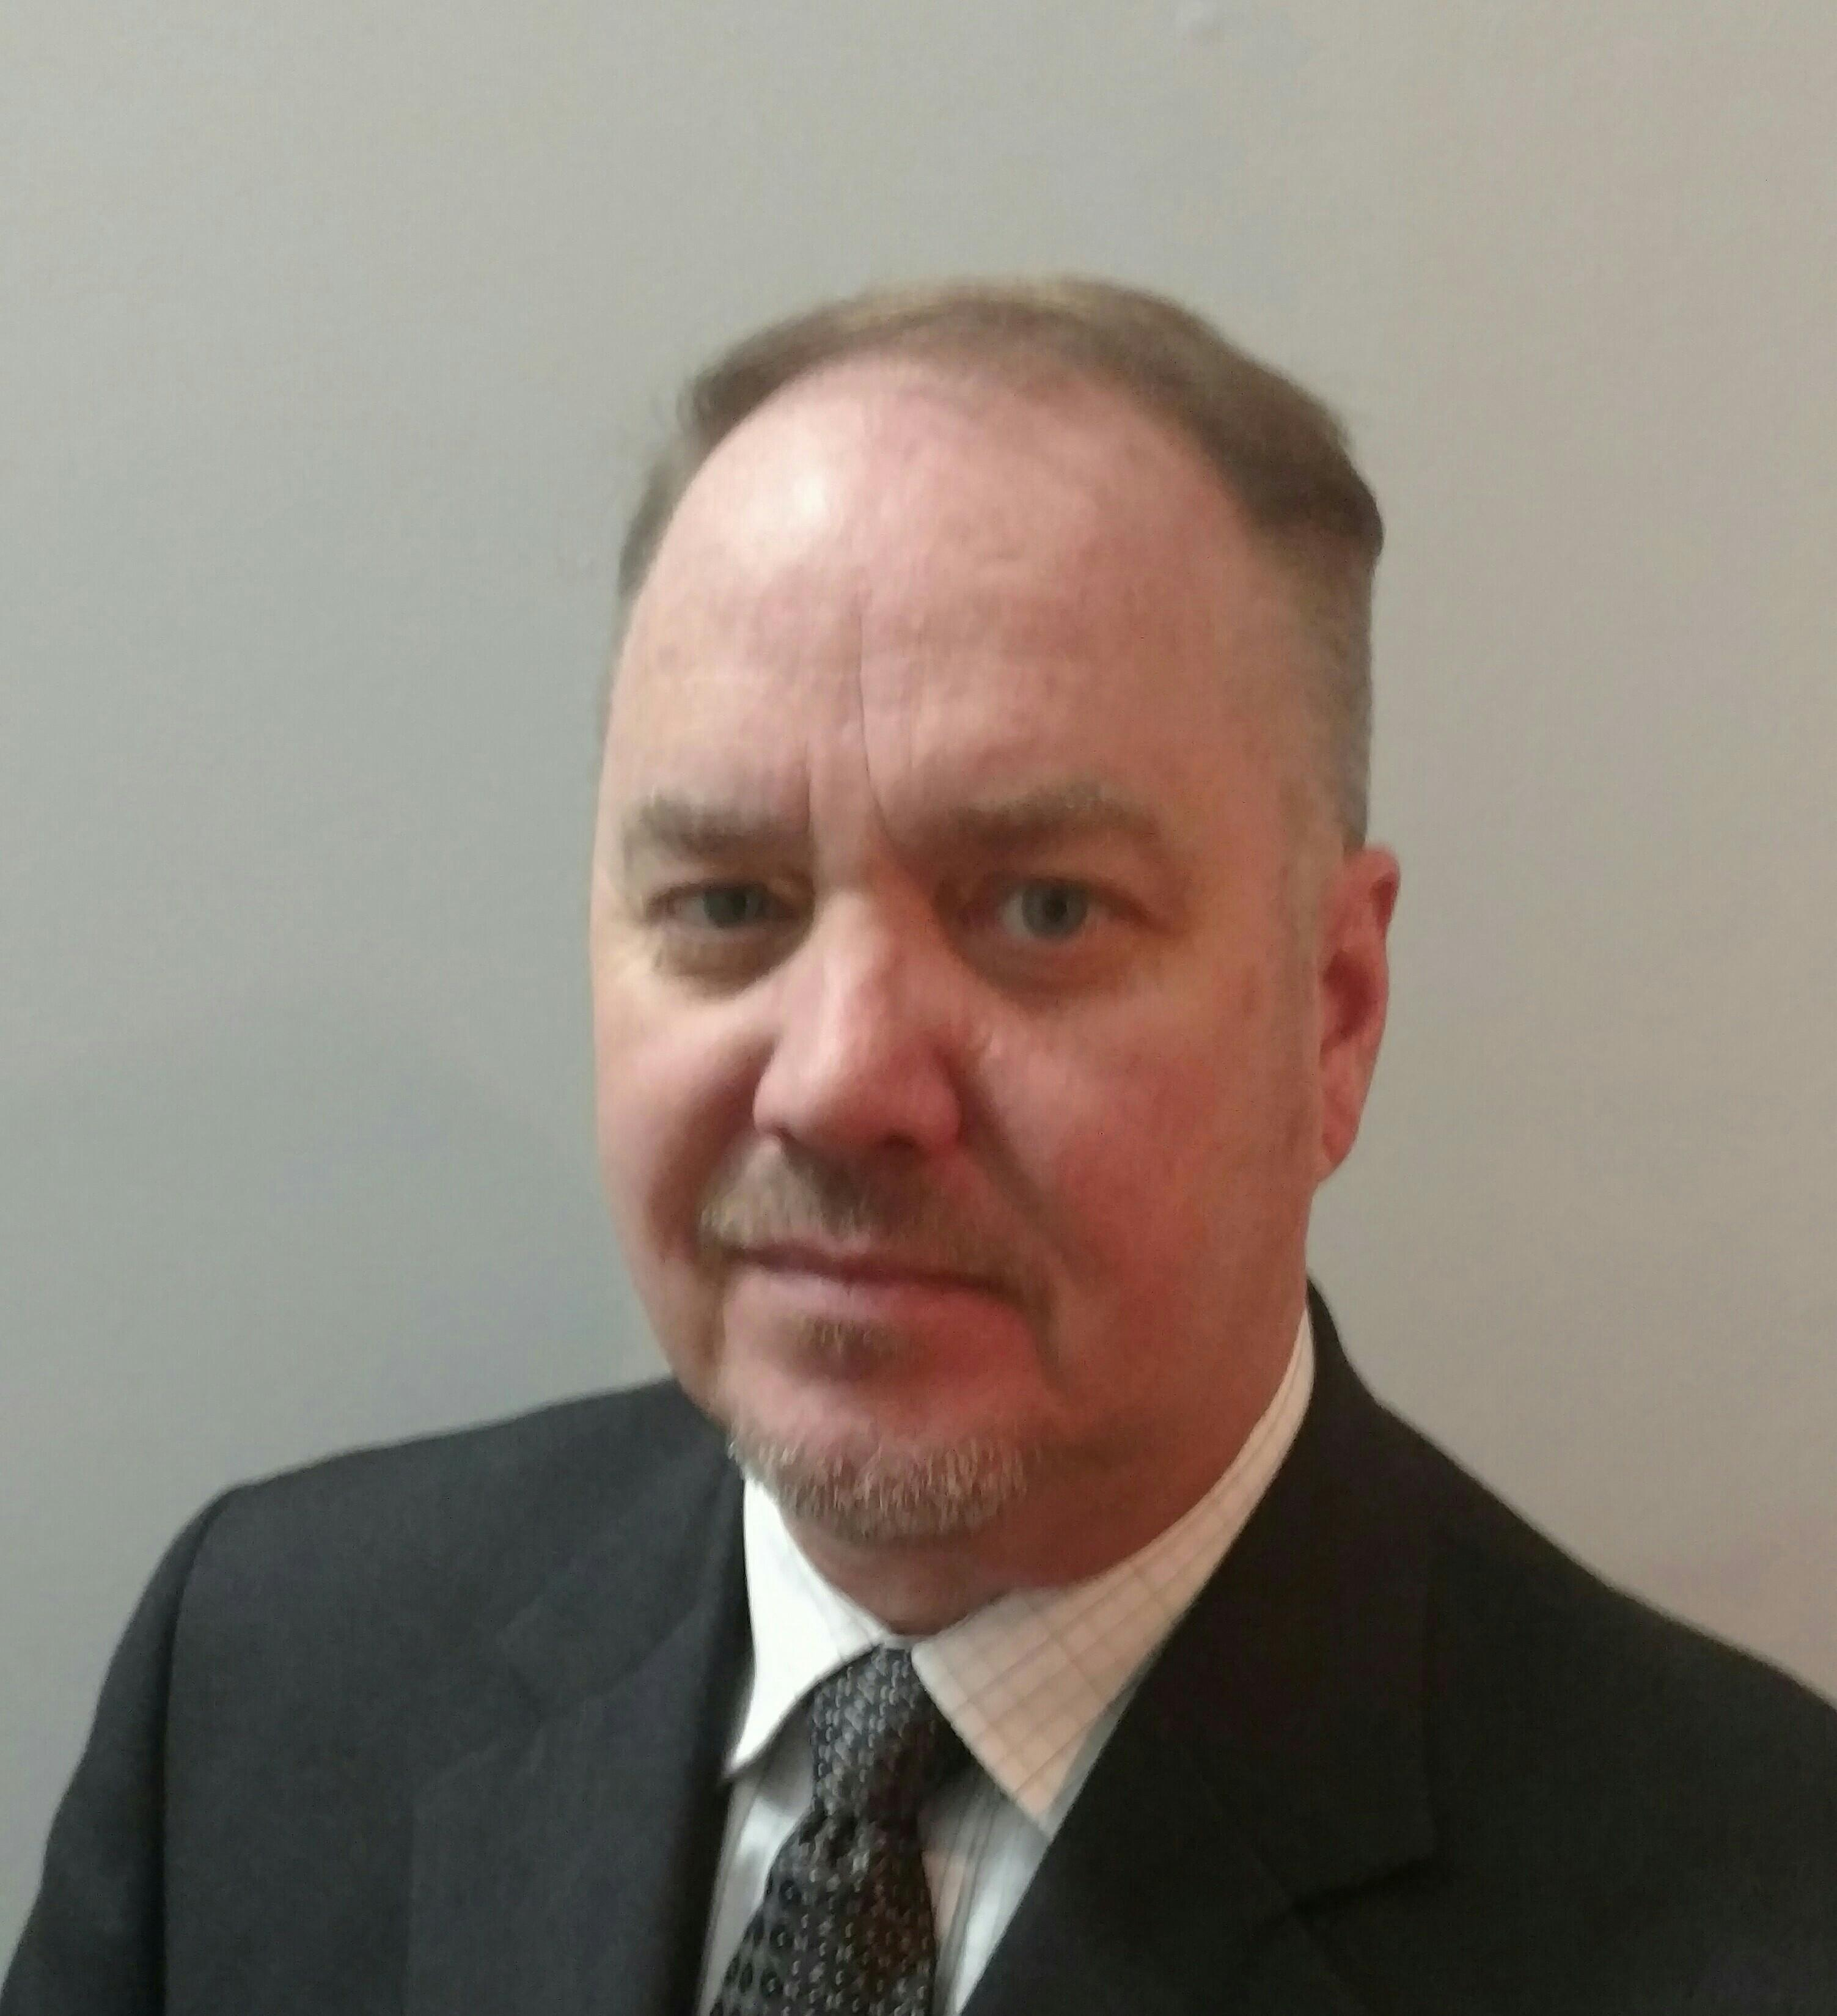 JOHN F. JOHNSON Your Financial Professional & Insurance Agent